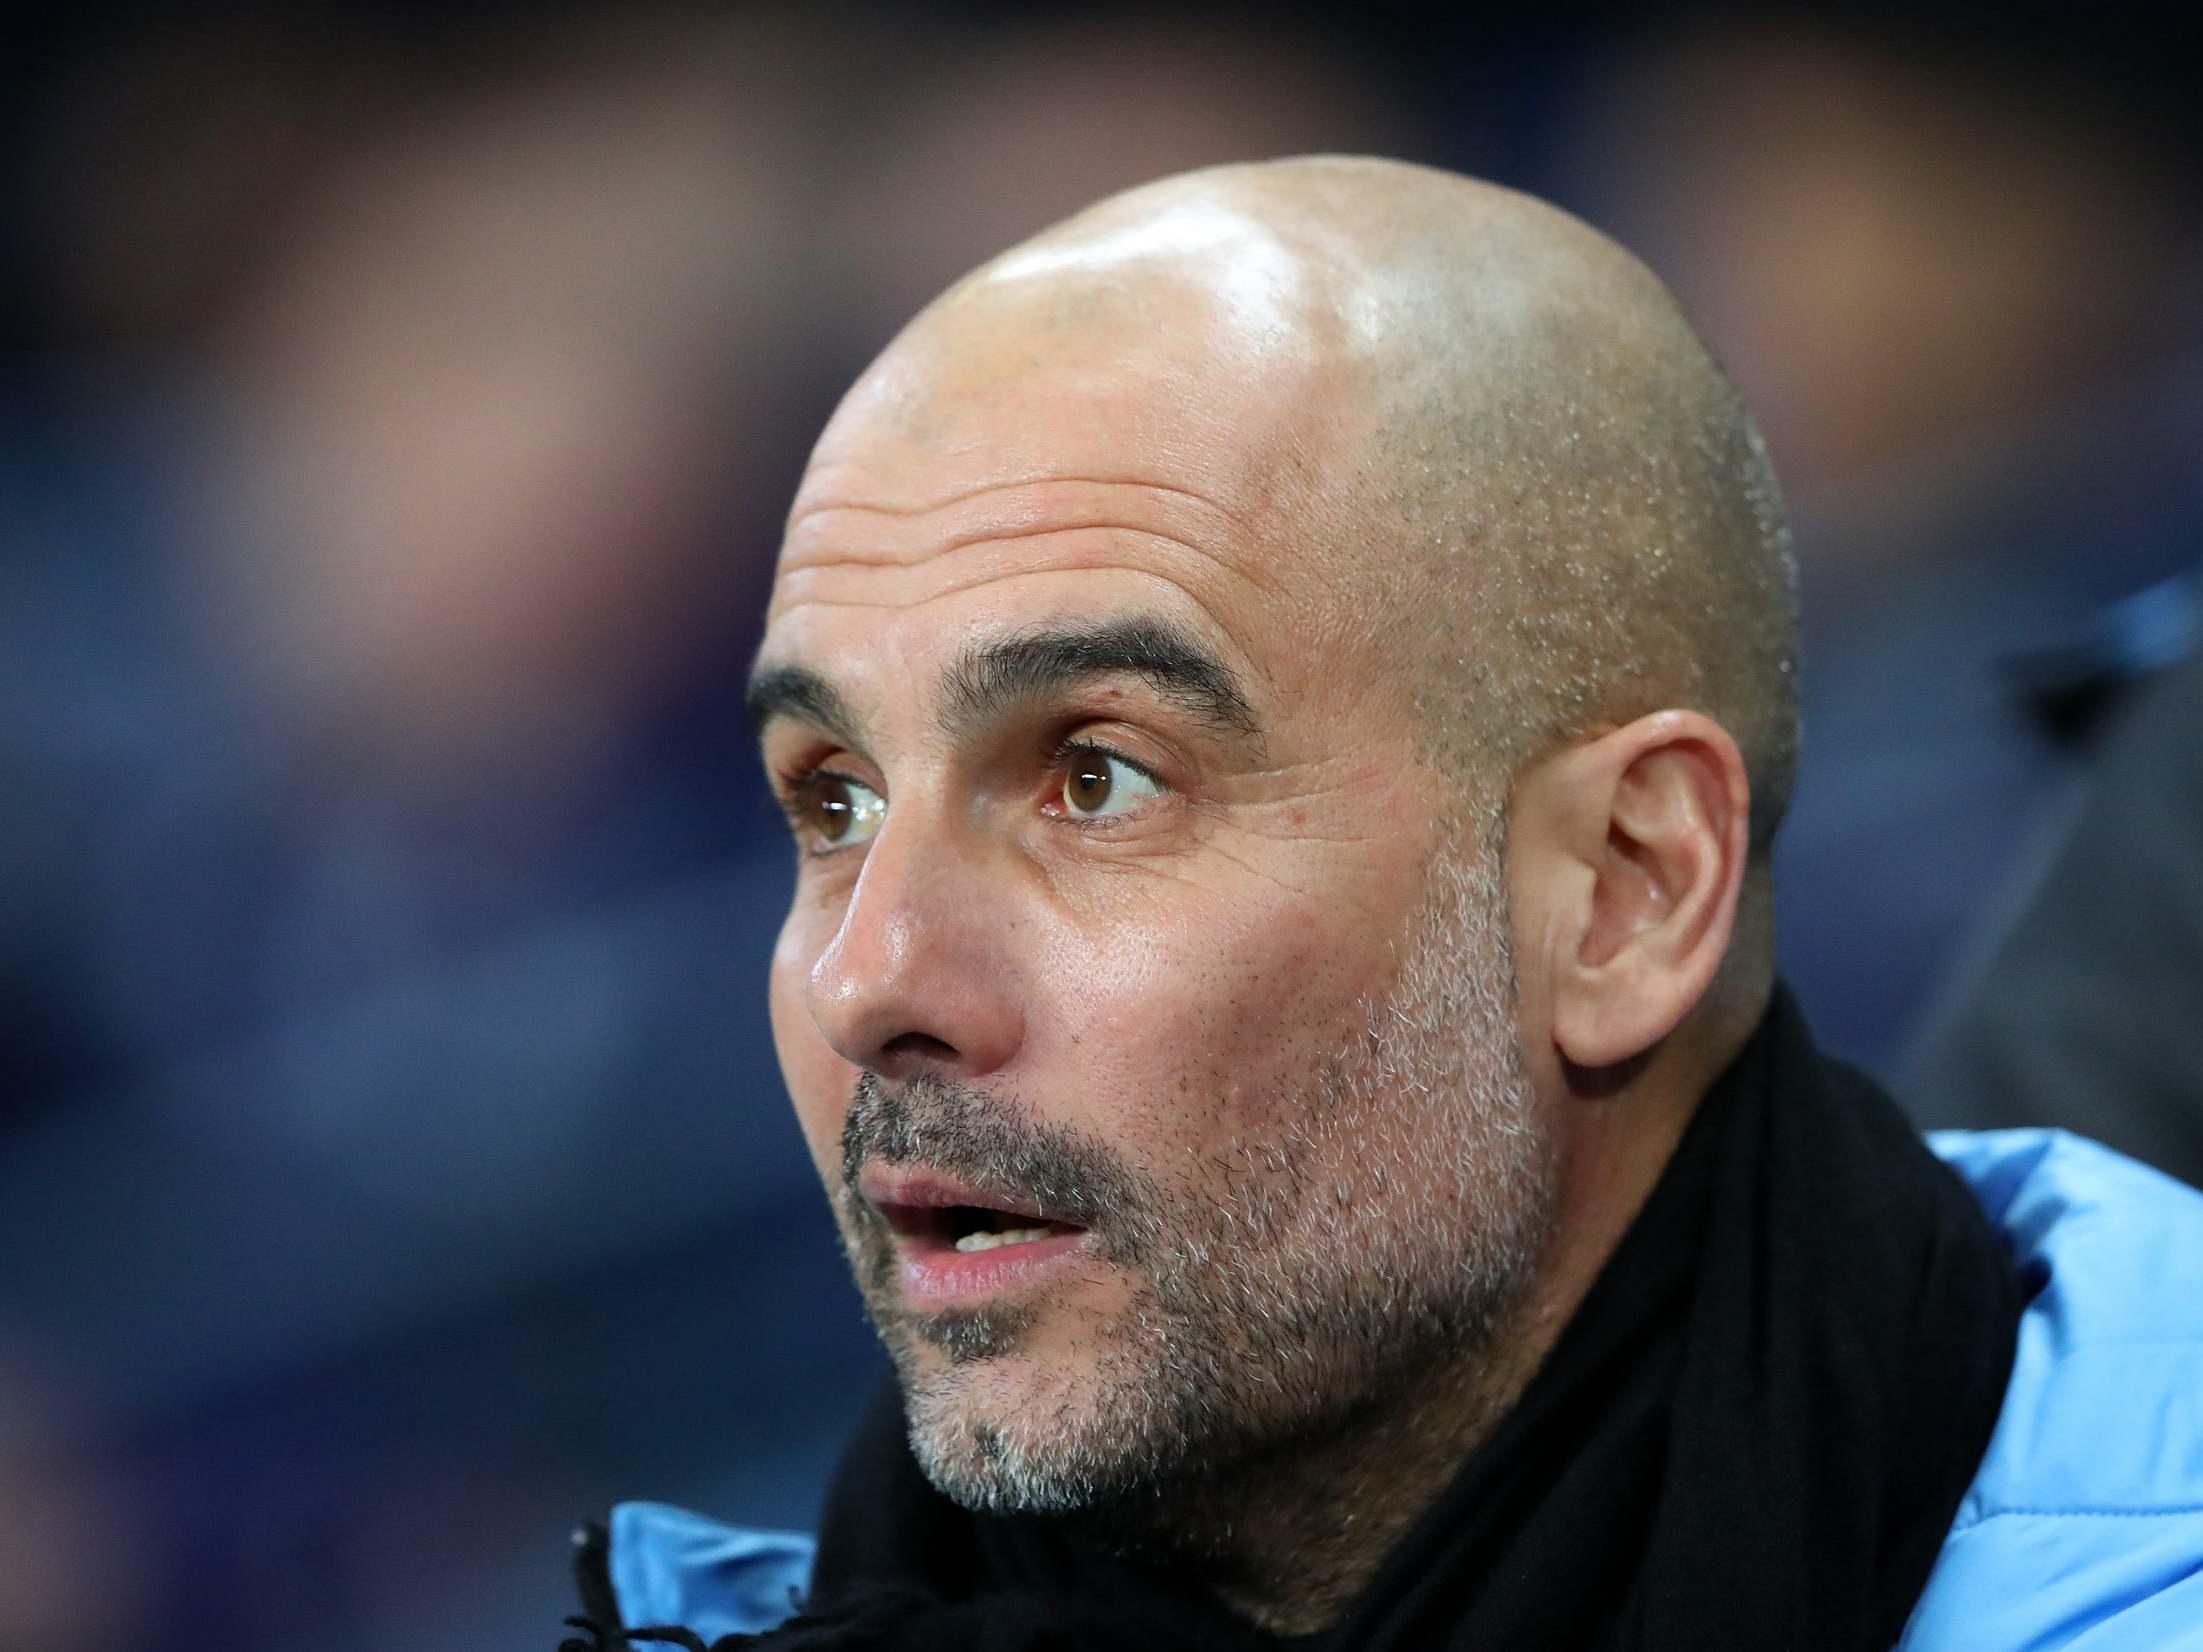 Zidane hails Guardiola as best coach in the world before showdown